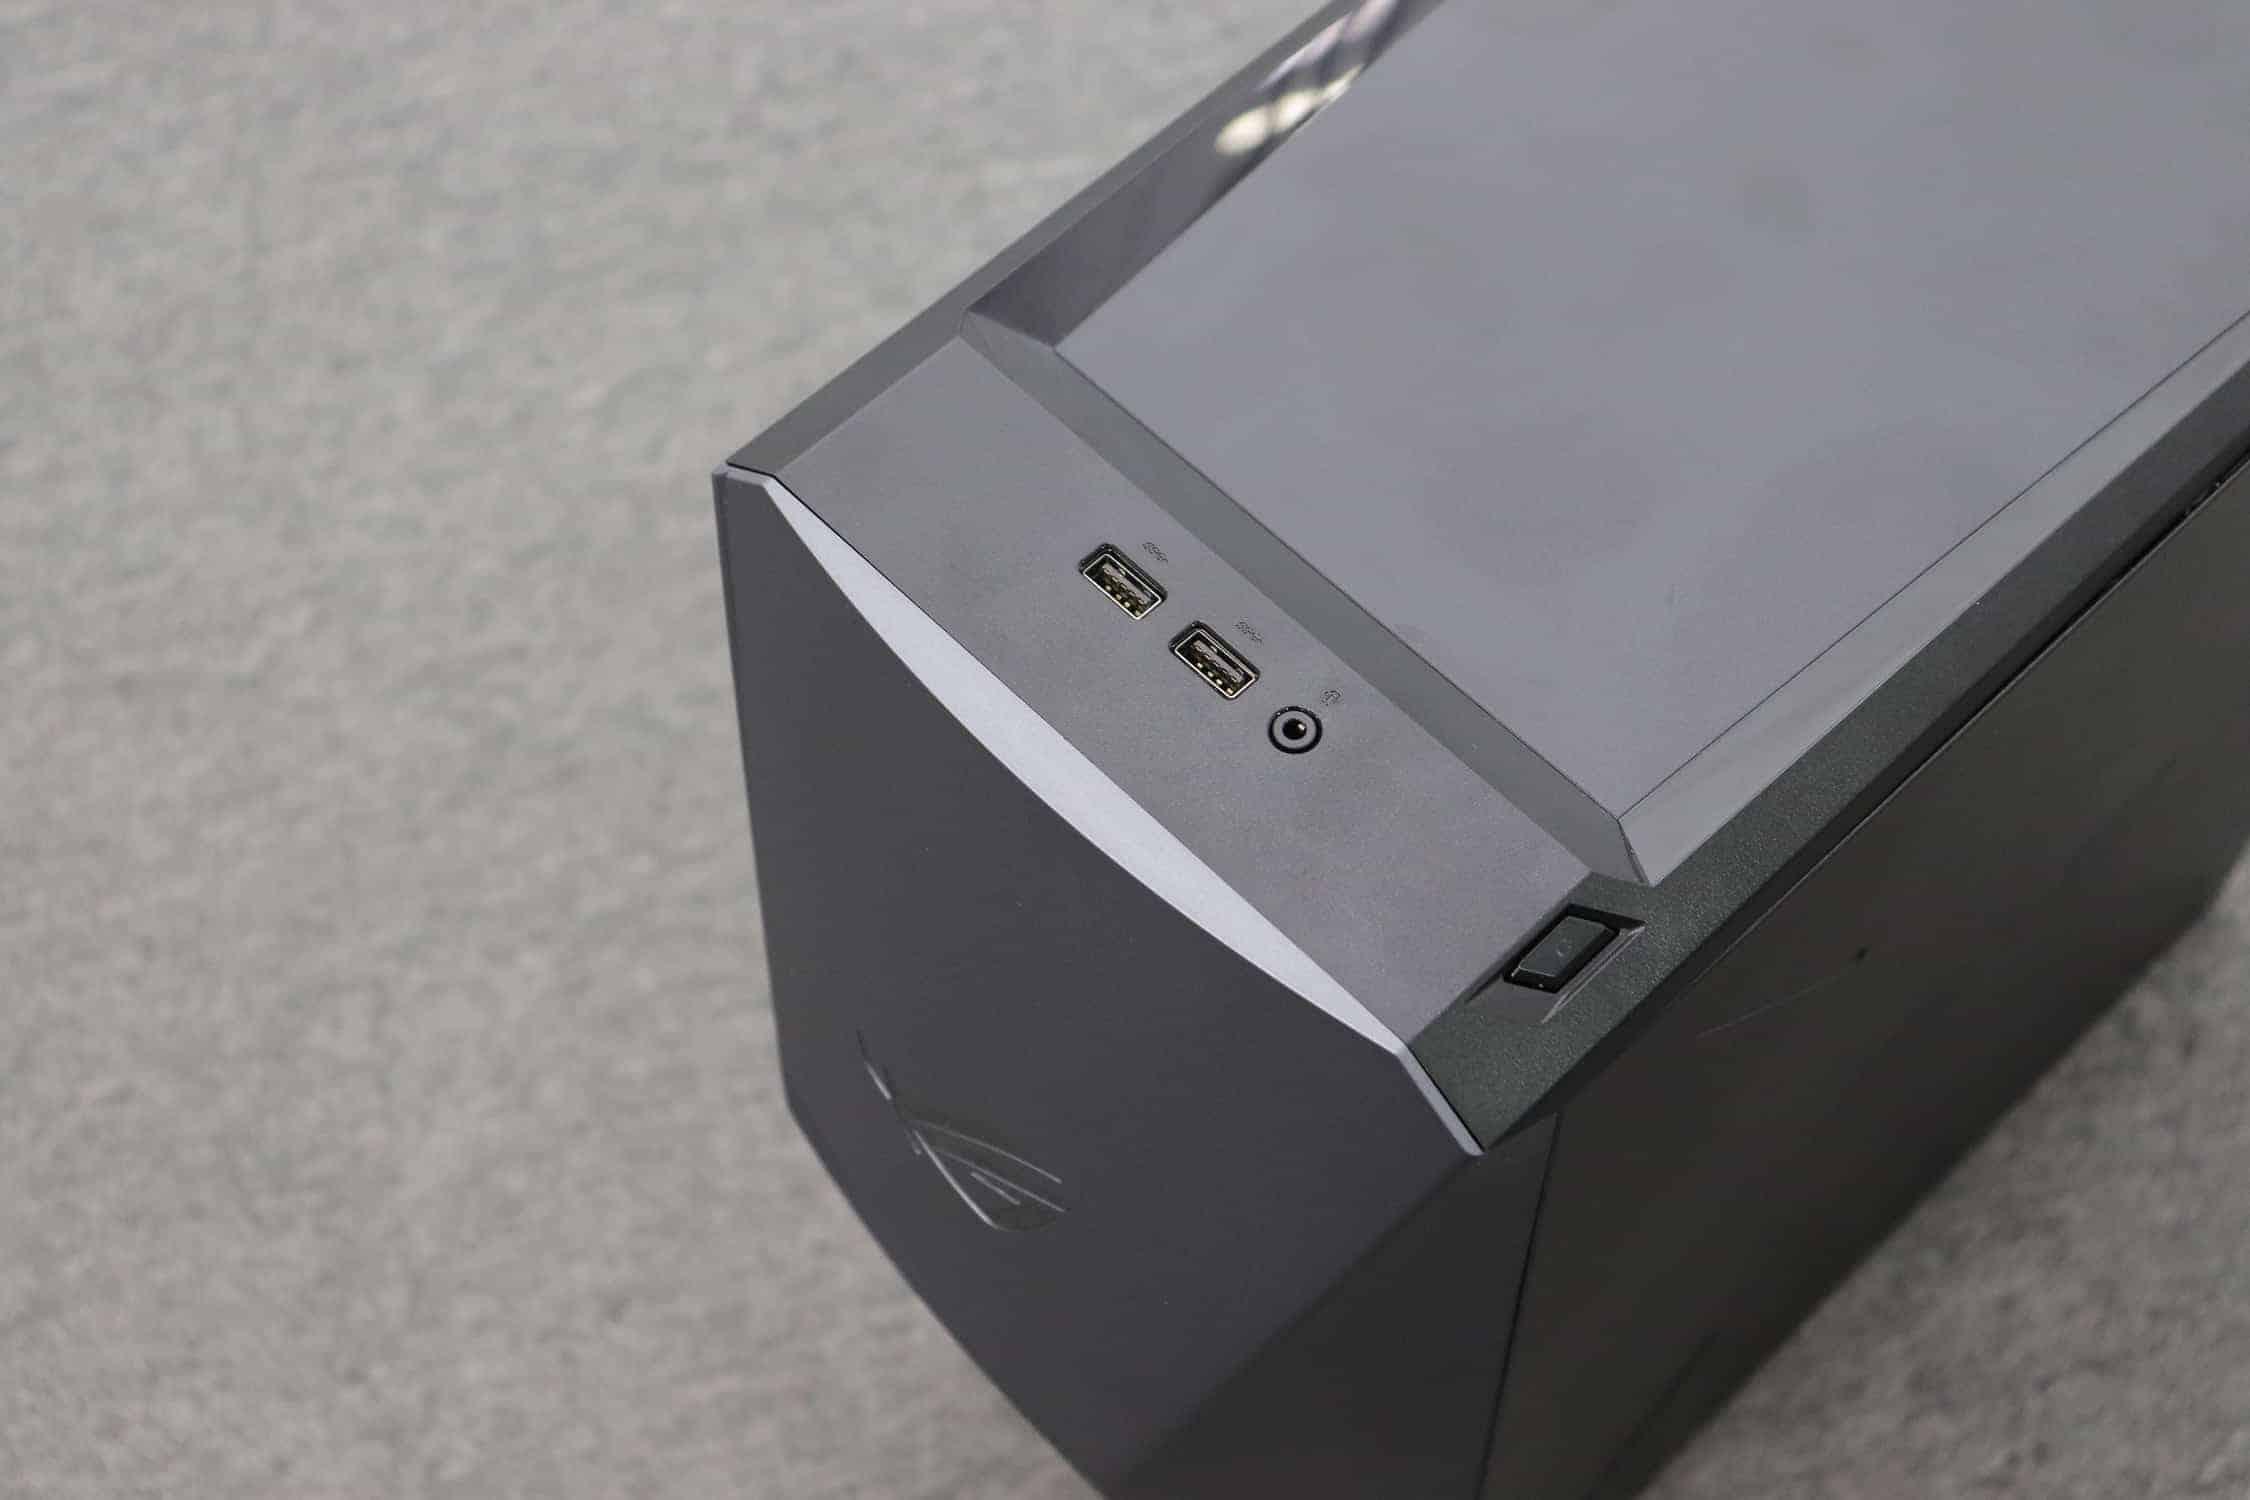 ▲ USB 포트 2개와 헤드셋 단자 그리고 측면의 전원 버튼 ⓒ 갓잇코리아